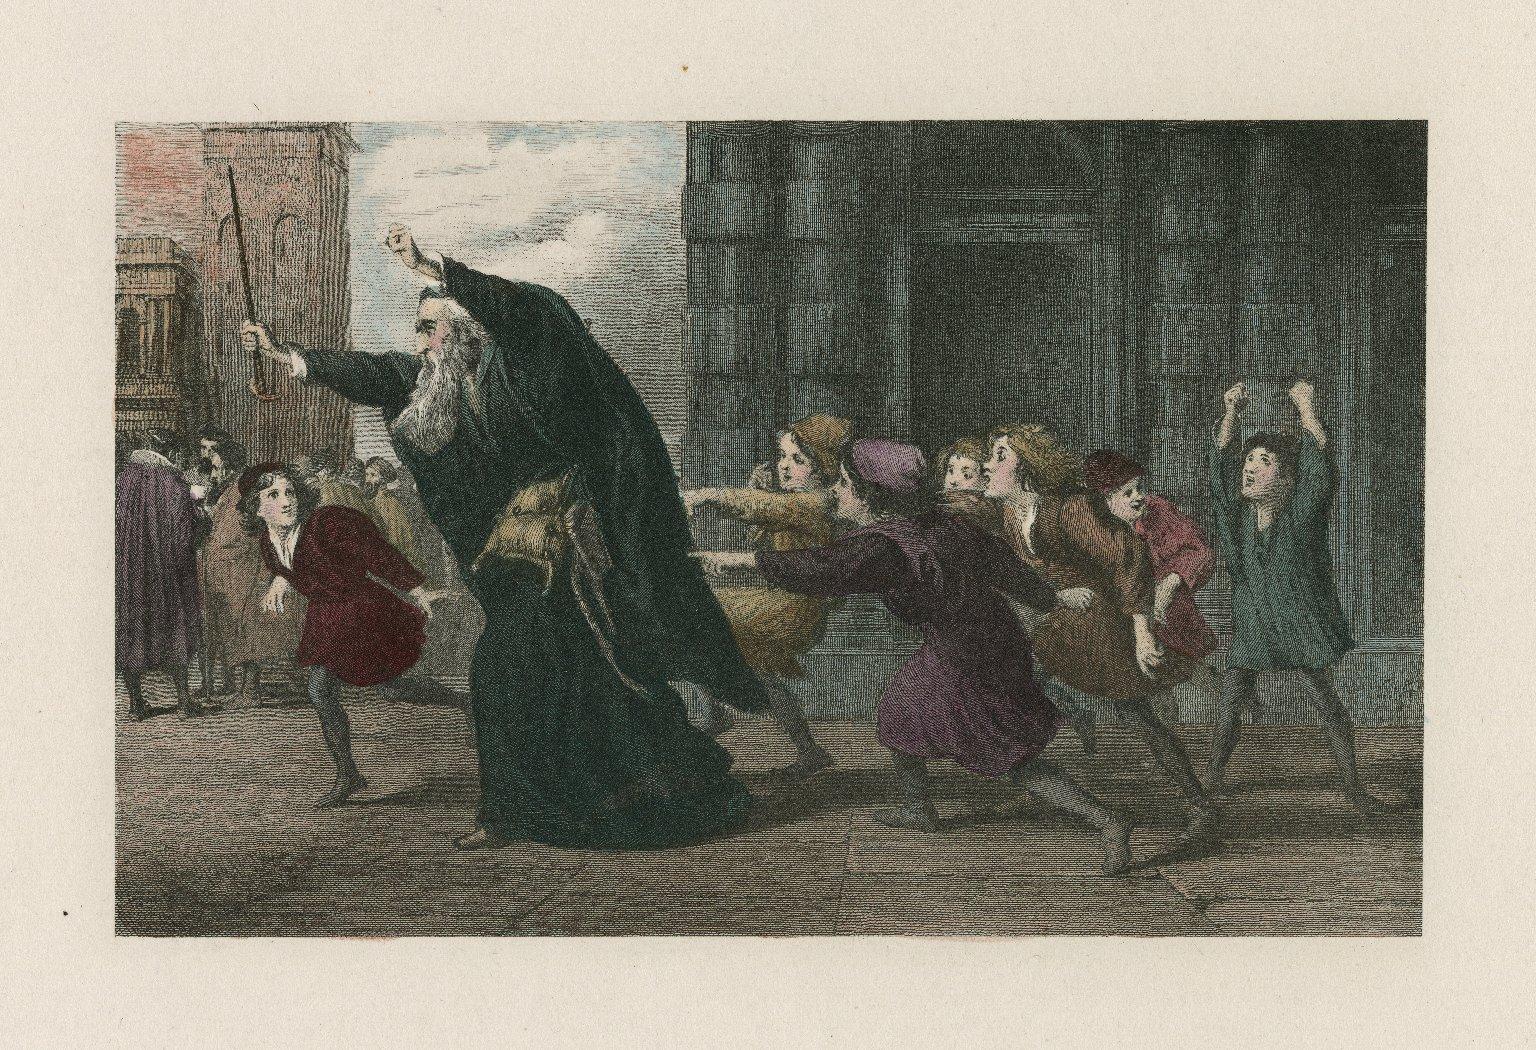 Shylock after the trial : merchant of Venice [scene spoken of by Salarino II, 8. Title misinforming] [graphic] / Sir John Gilbert ARA, Pinxt. 1846 ; G. Greatbach, sculpt.